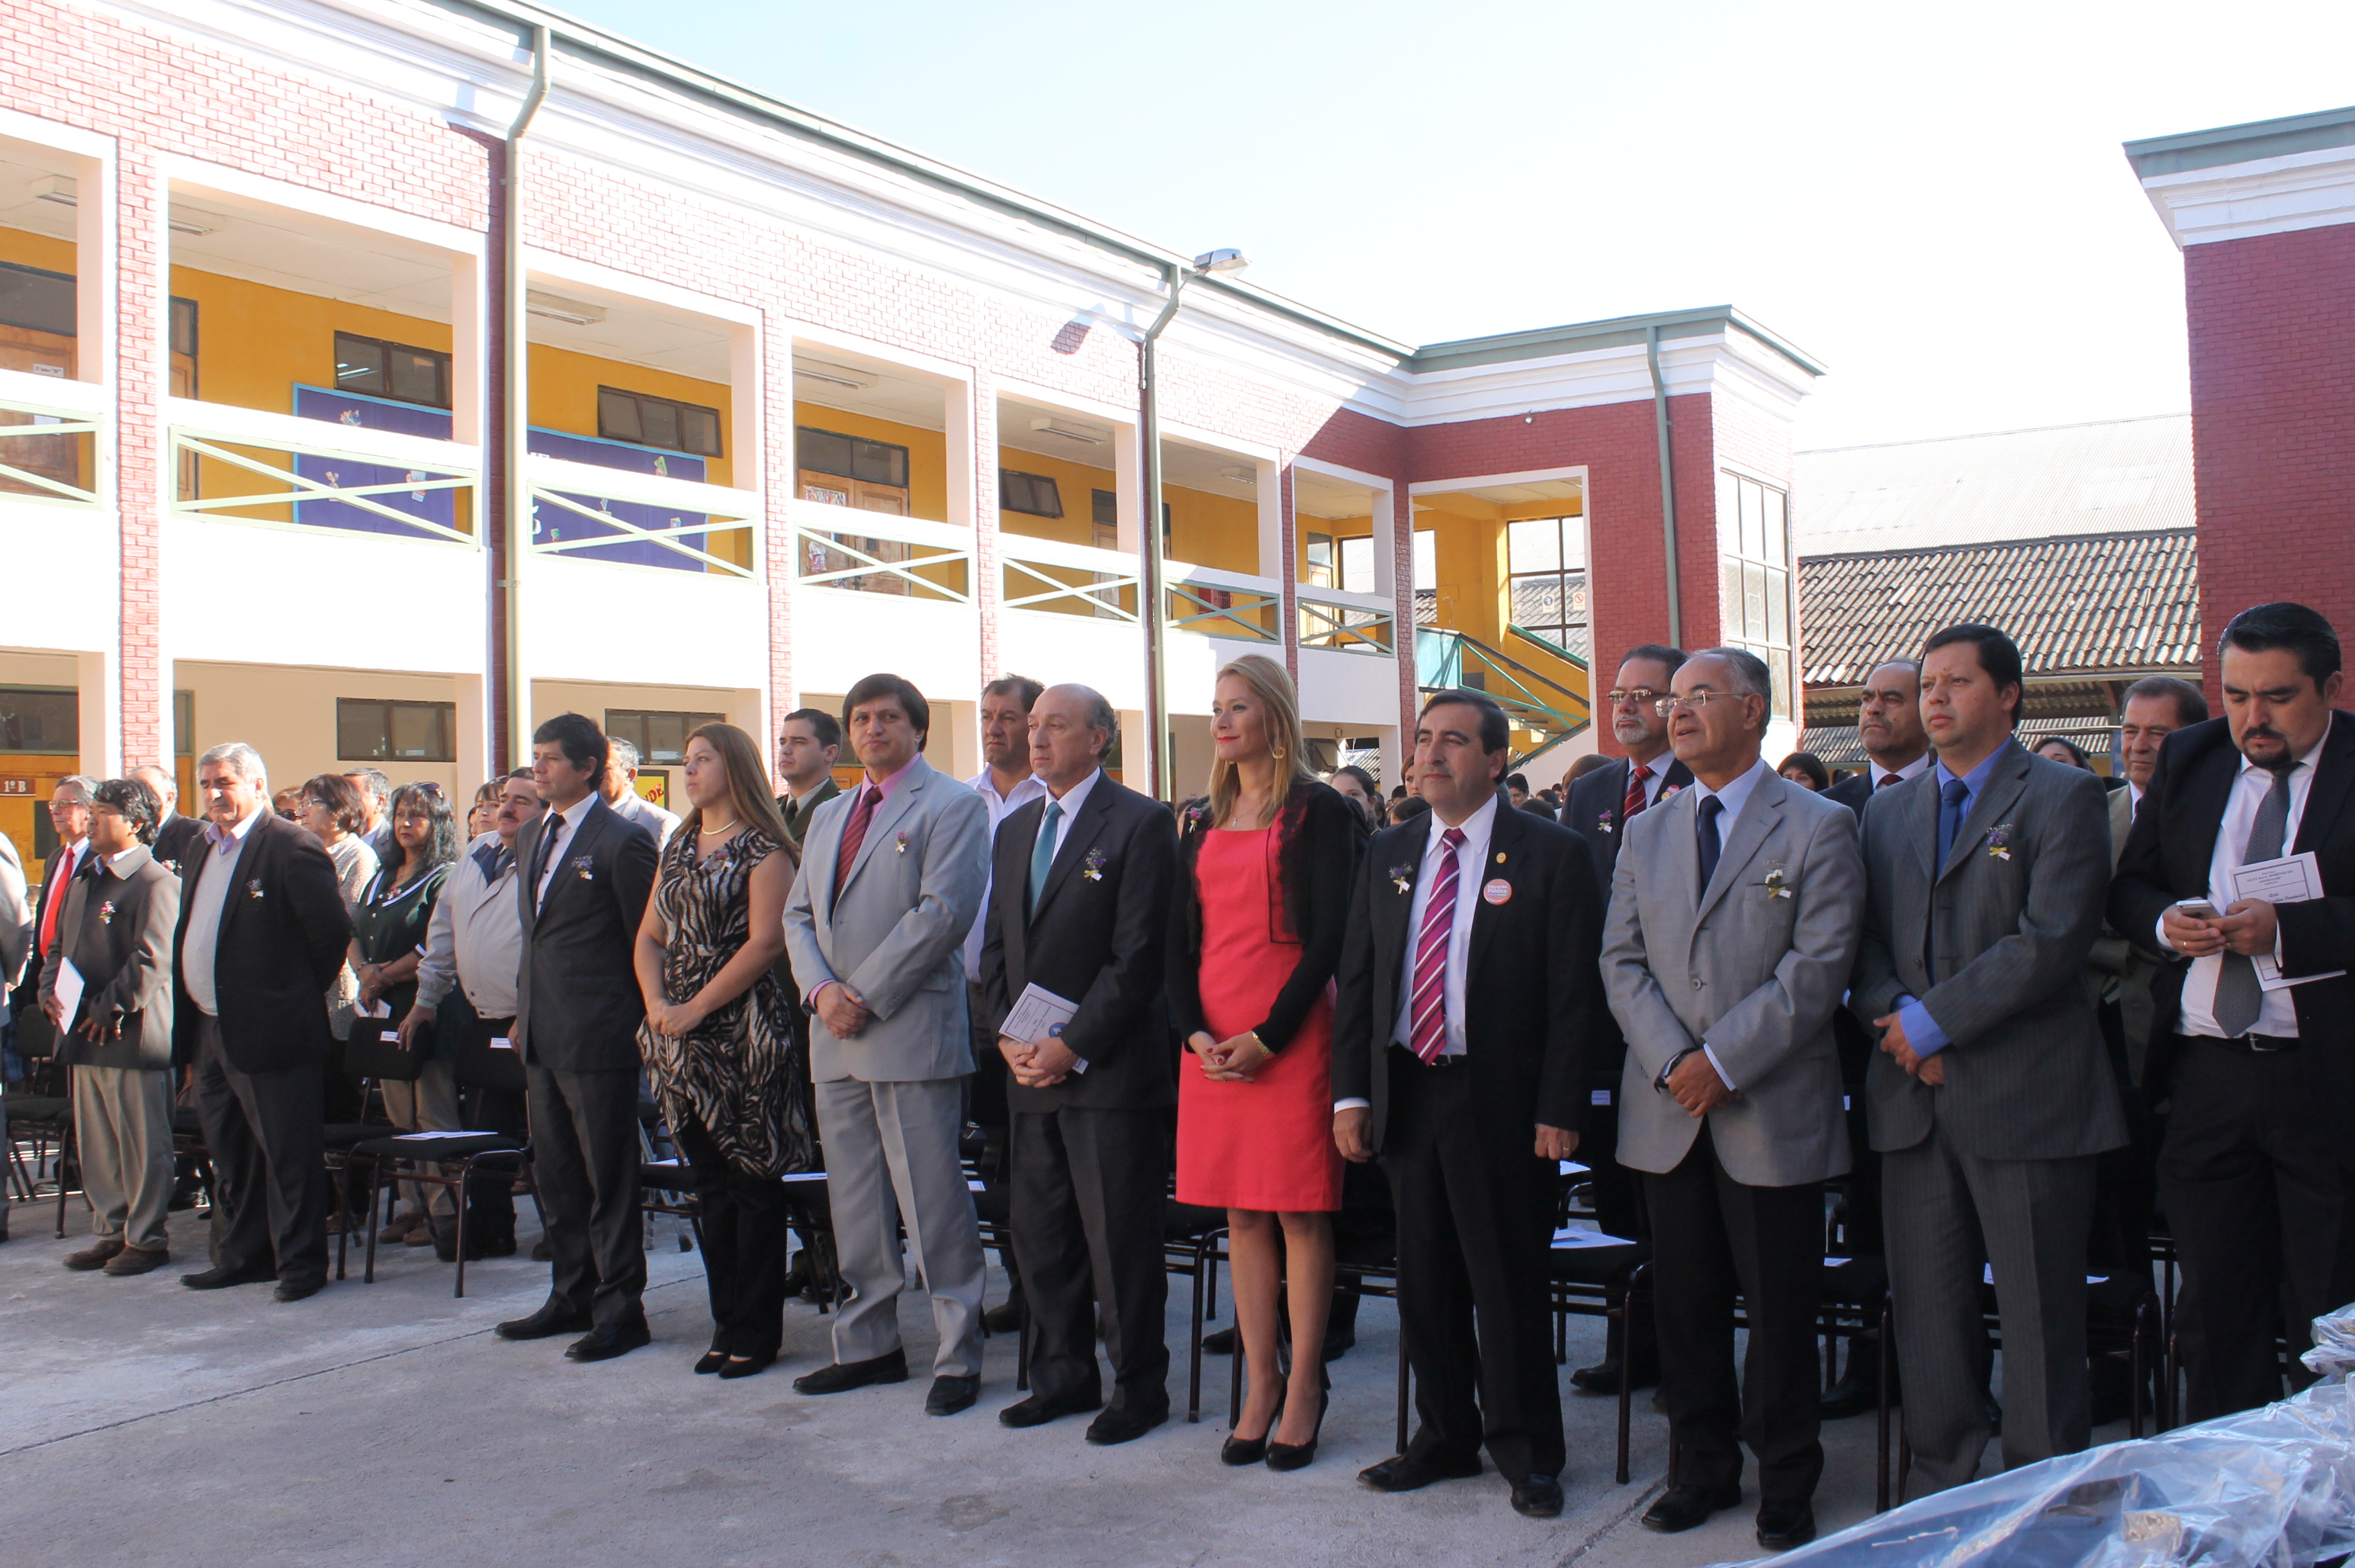 Autoridades destacan aporte del ministerio a la educación pública